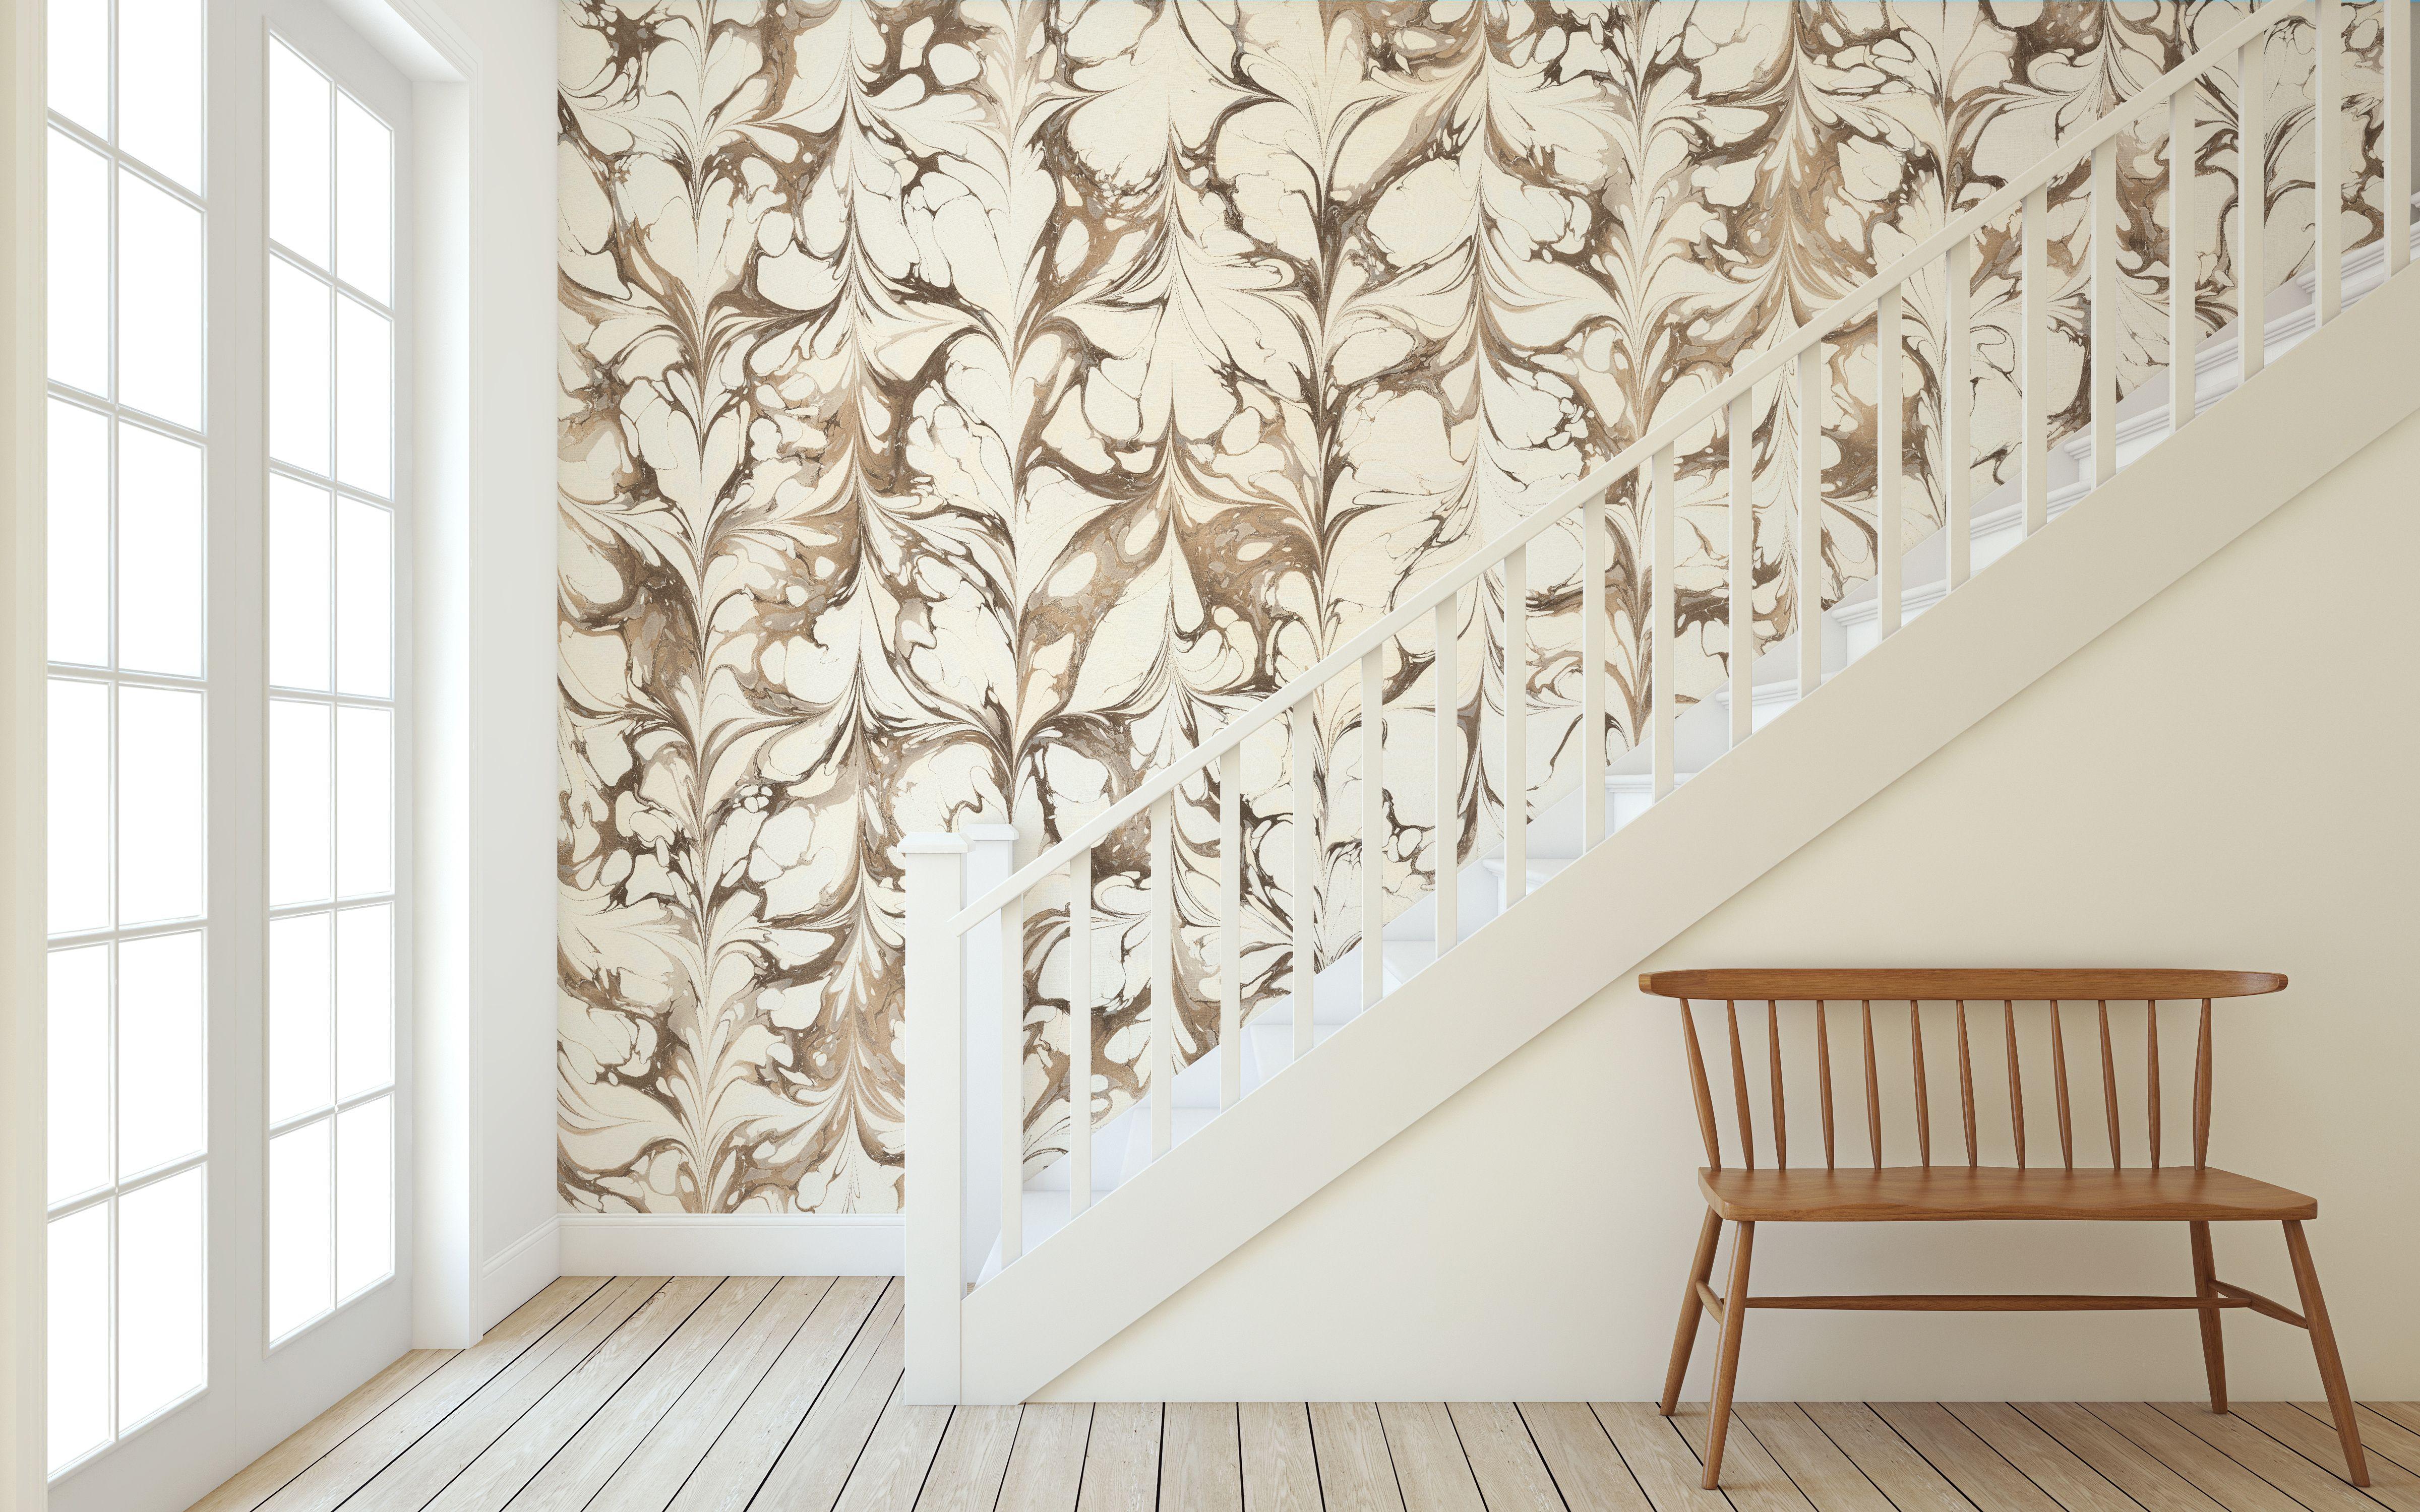 Wallpaper Installation How To Install Wallpaper Rule Of Three Wallpaper